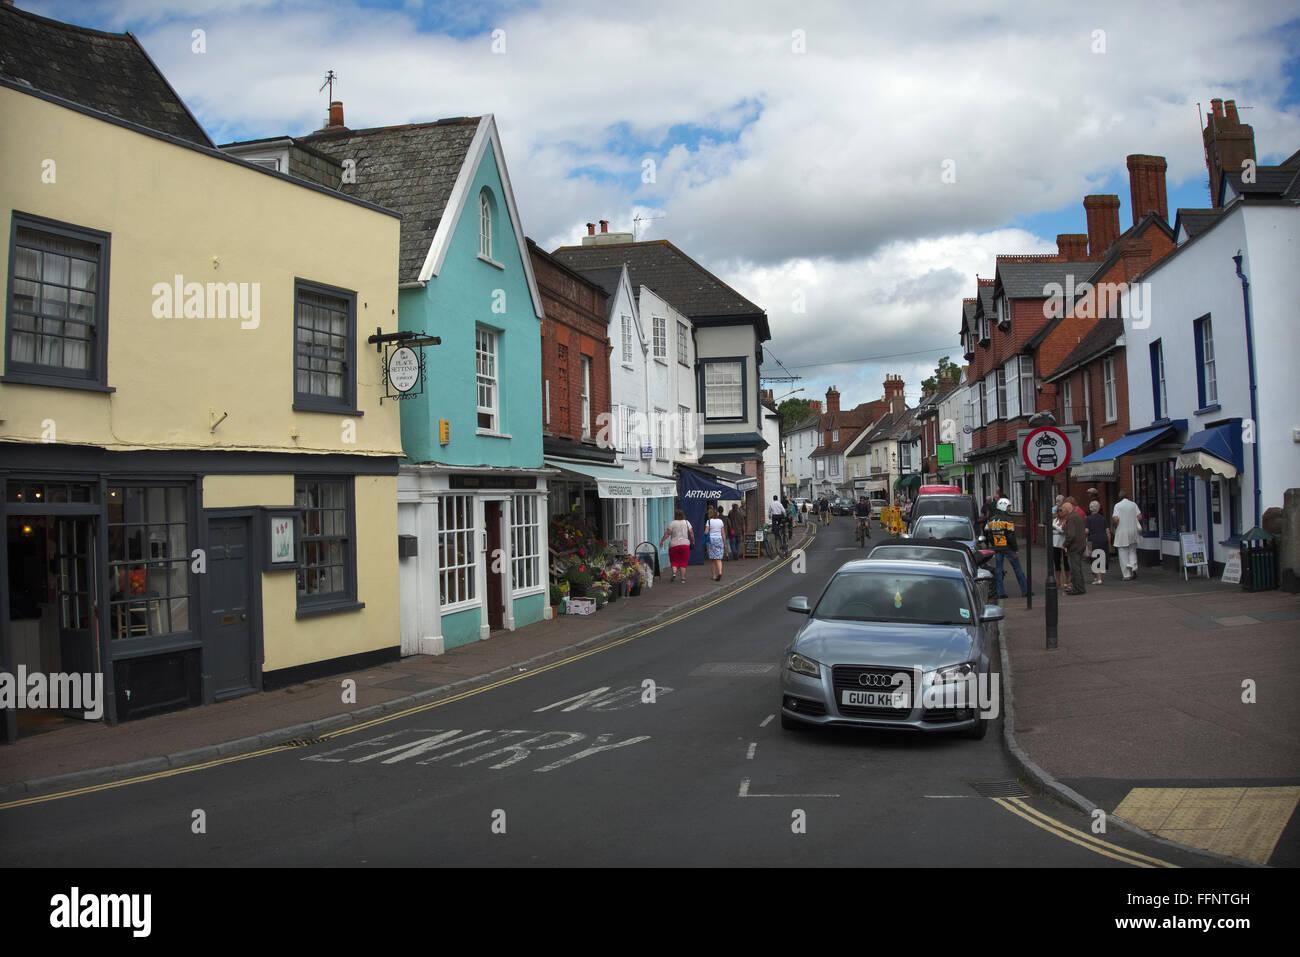 Fore St, Topsham, Devon UK - Stock Image